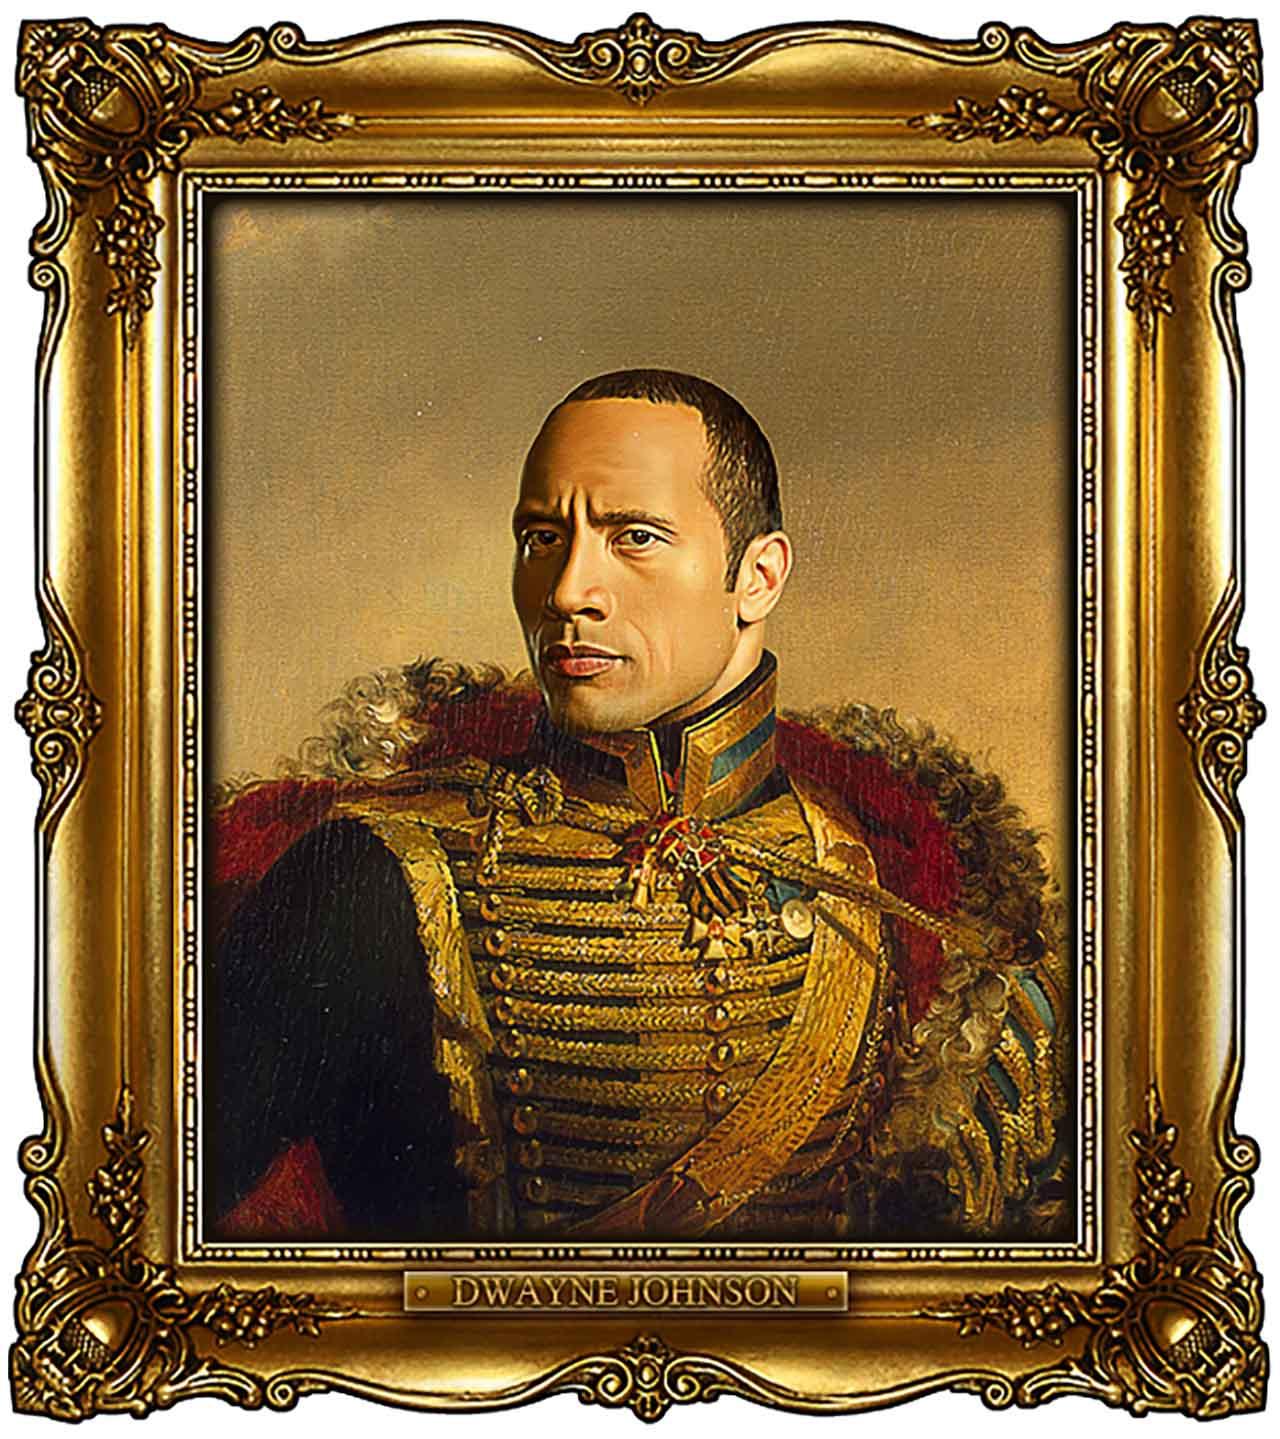 Artist Turns Famous Actors Into Russian Generals - Dwayne Johnson